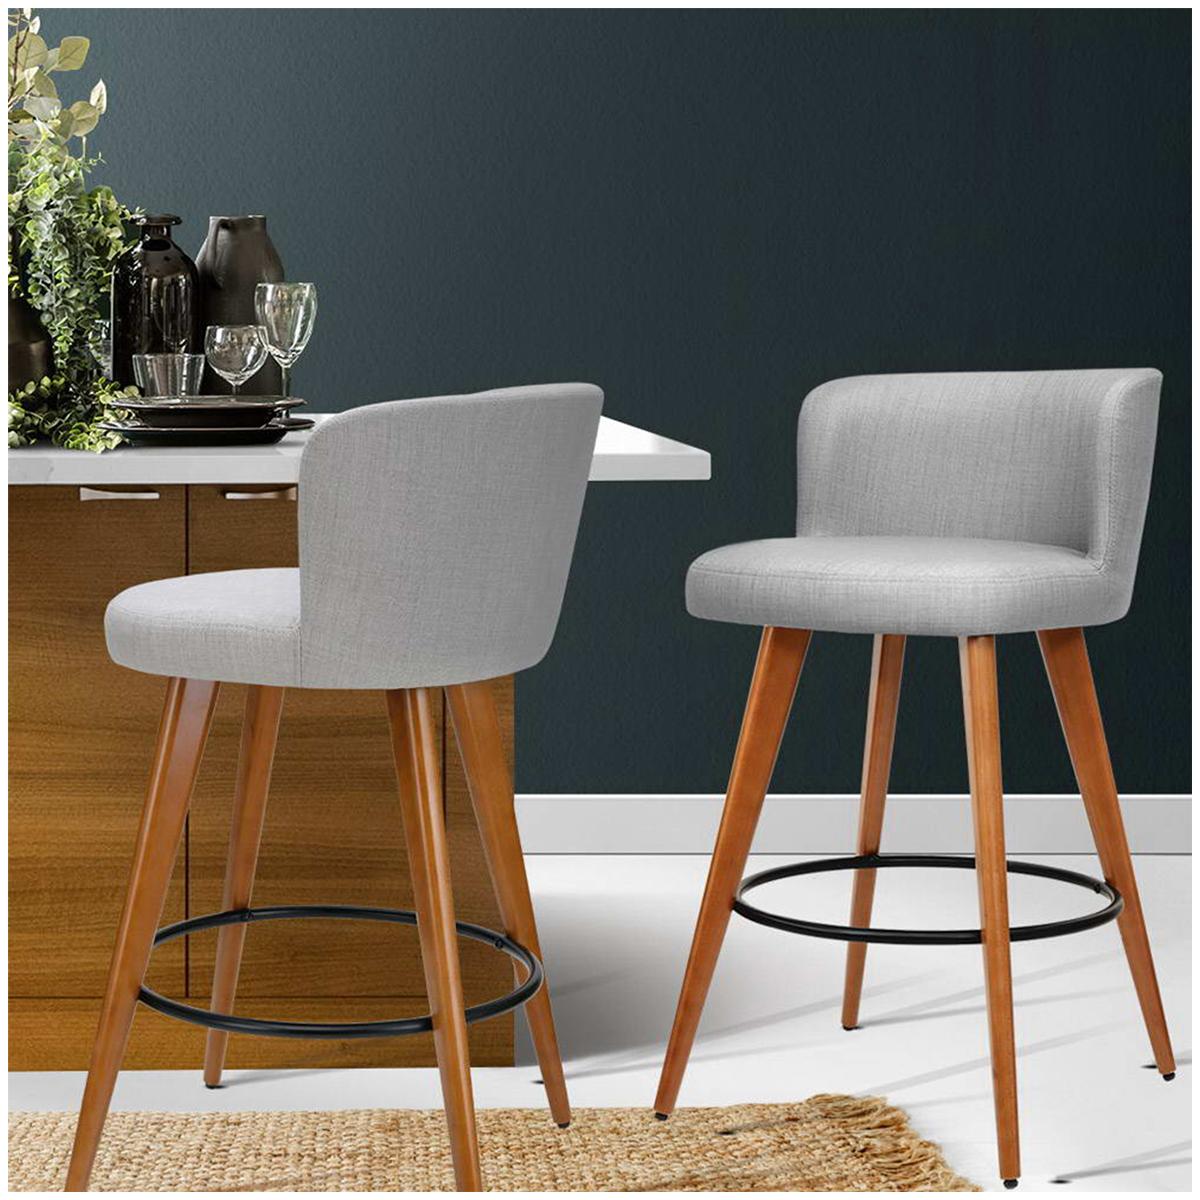 Artiss Grey Wooden Barstool 2pk image 4